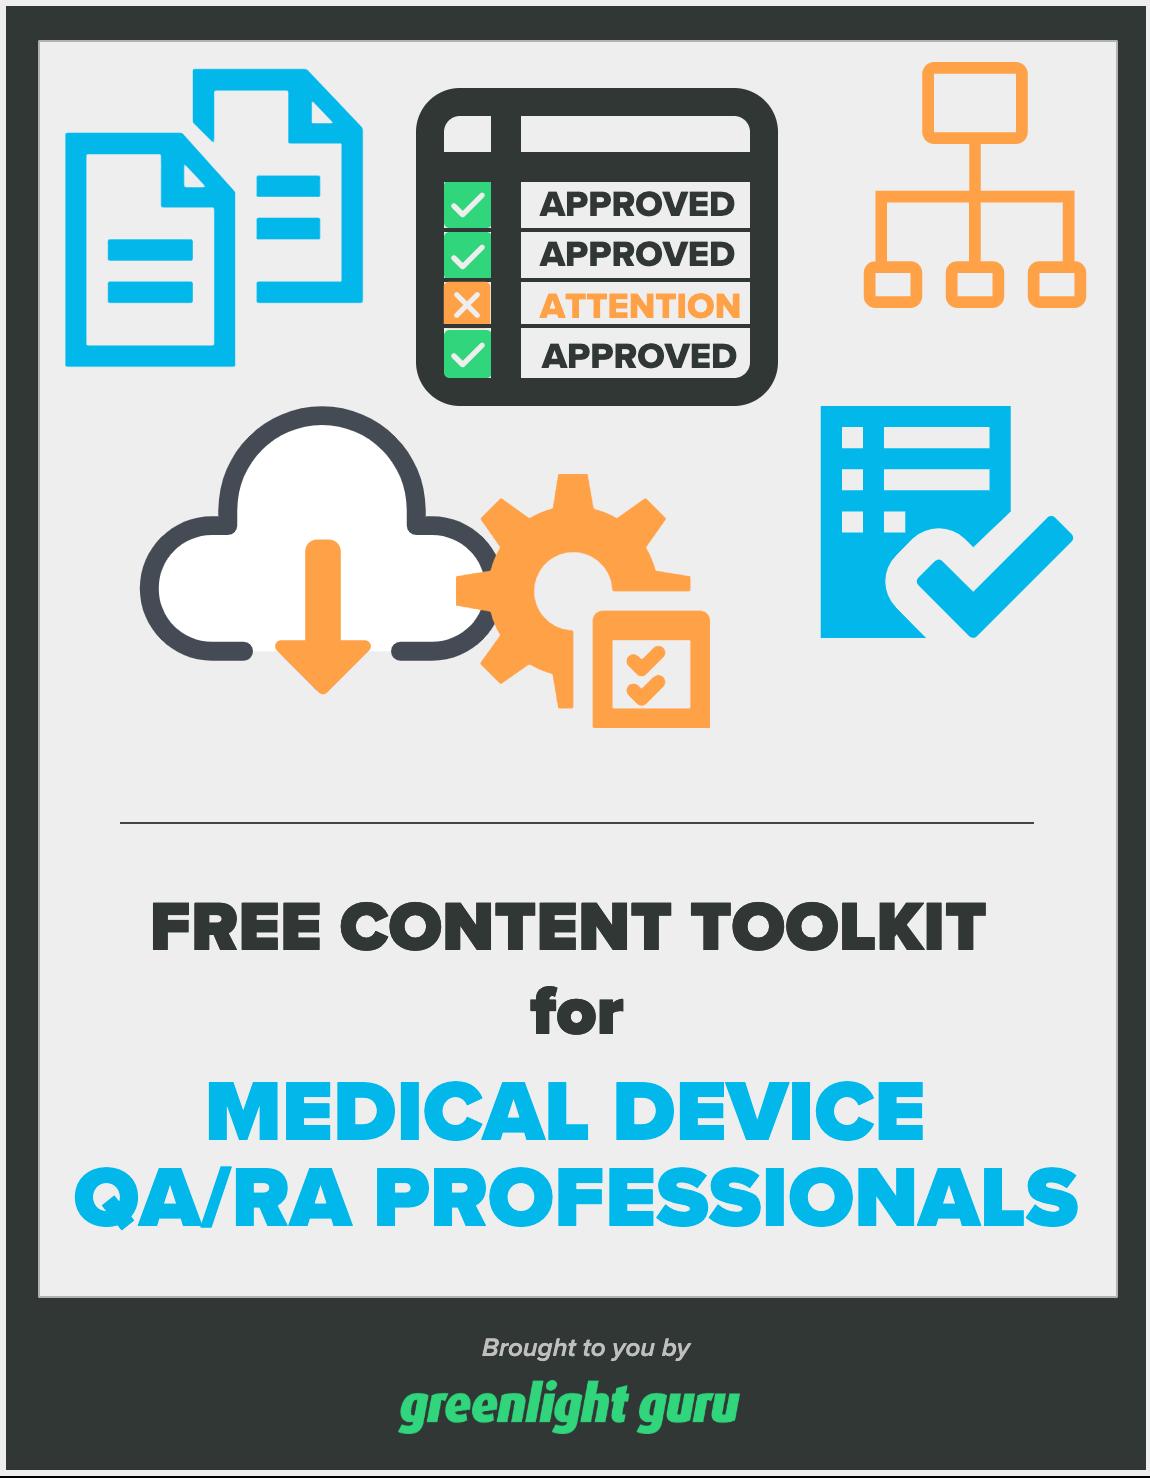 content toolkit for QA-RA professionals